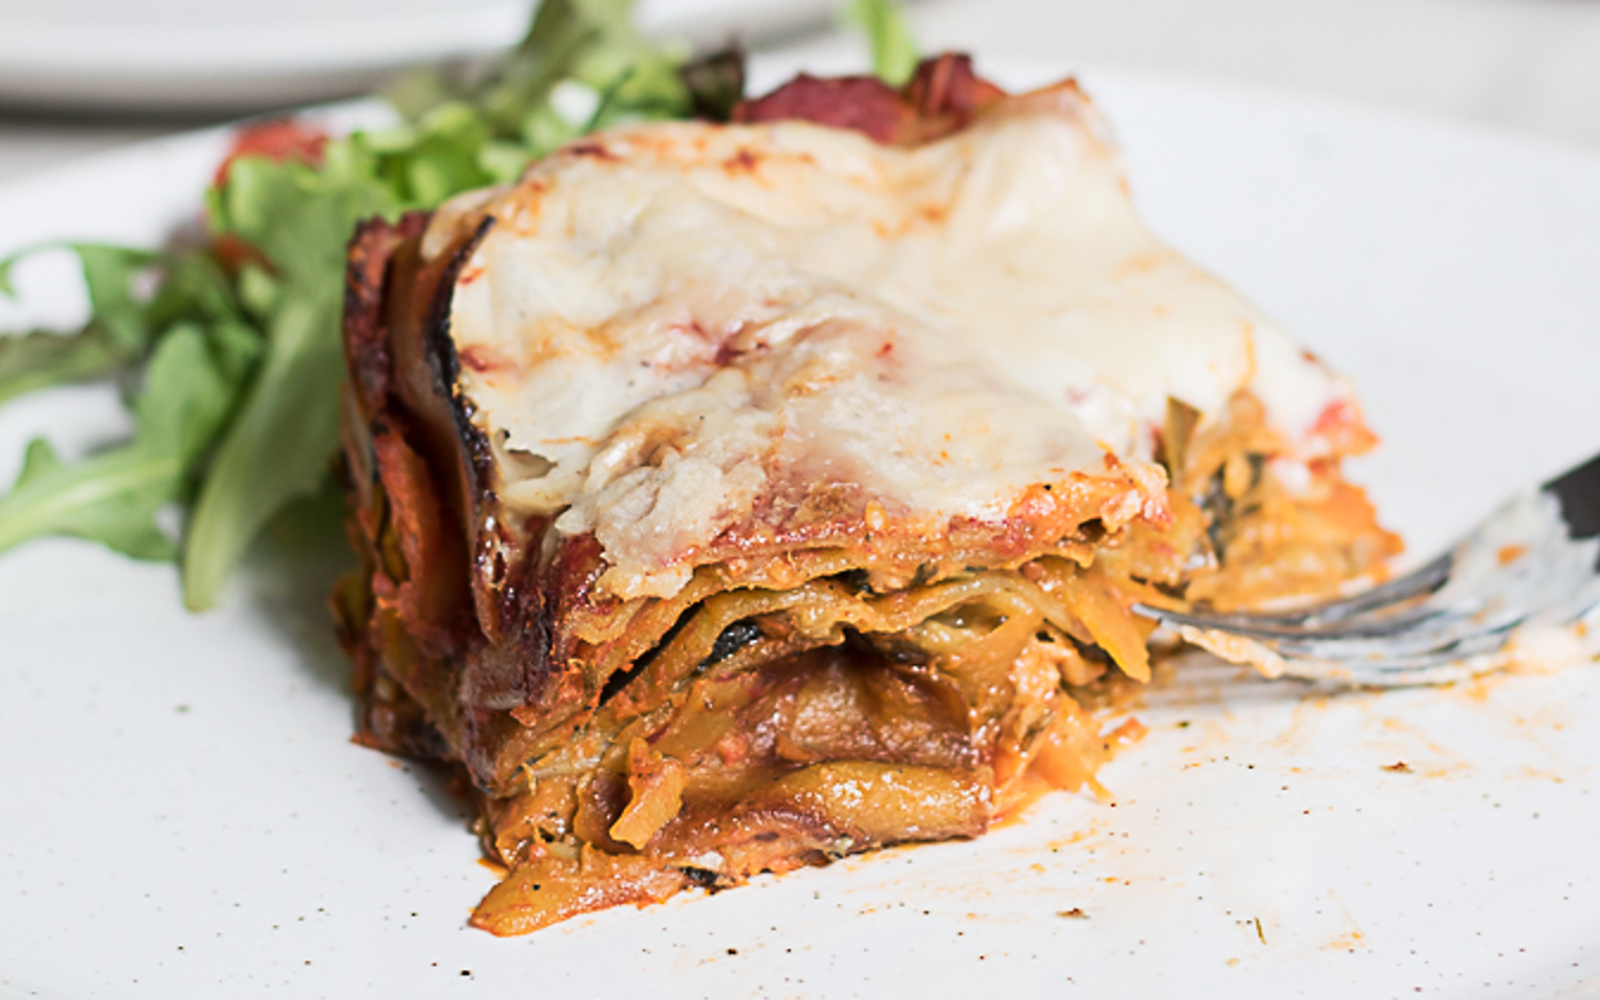 Tomato Eggplant Lasagna